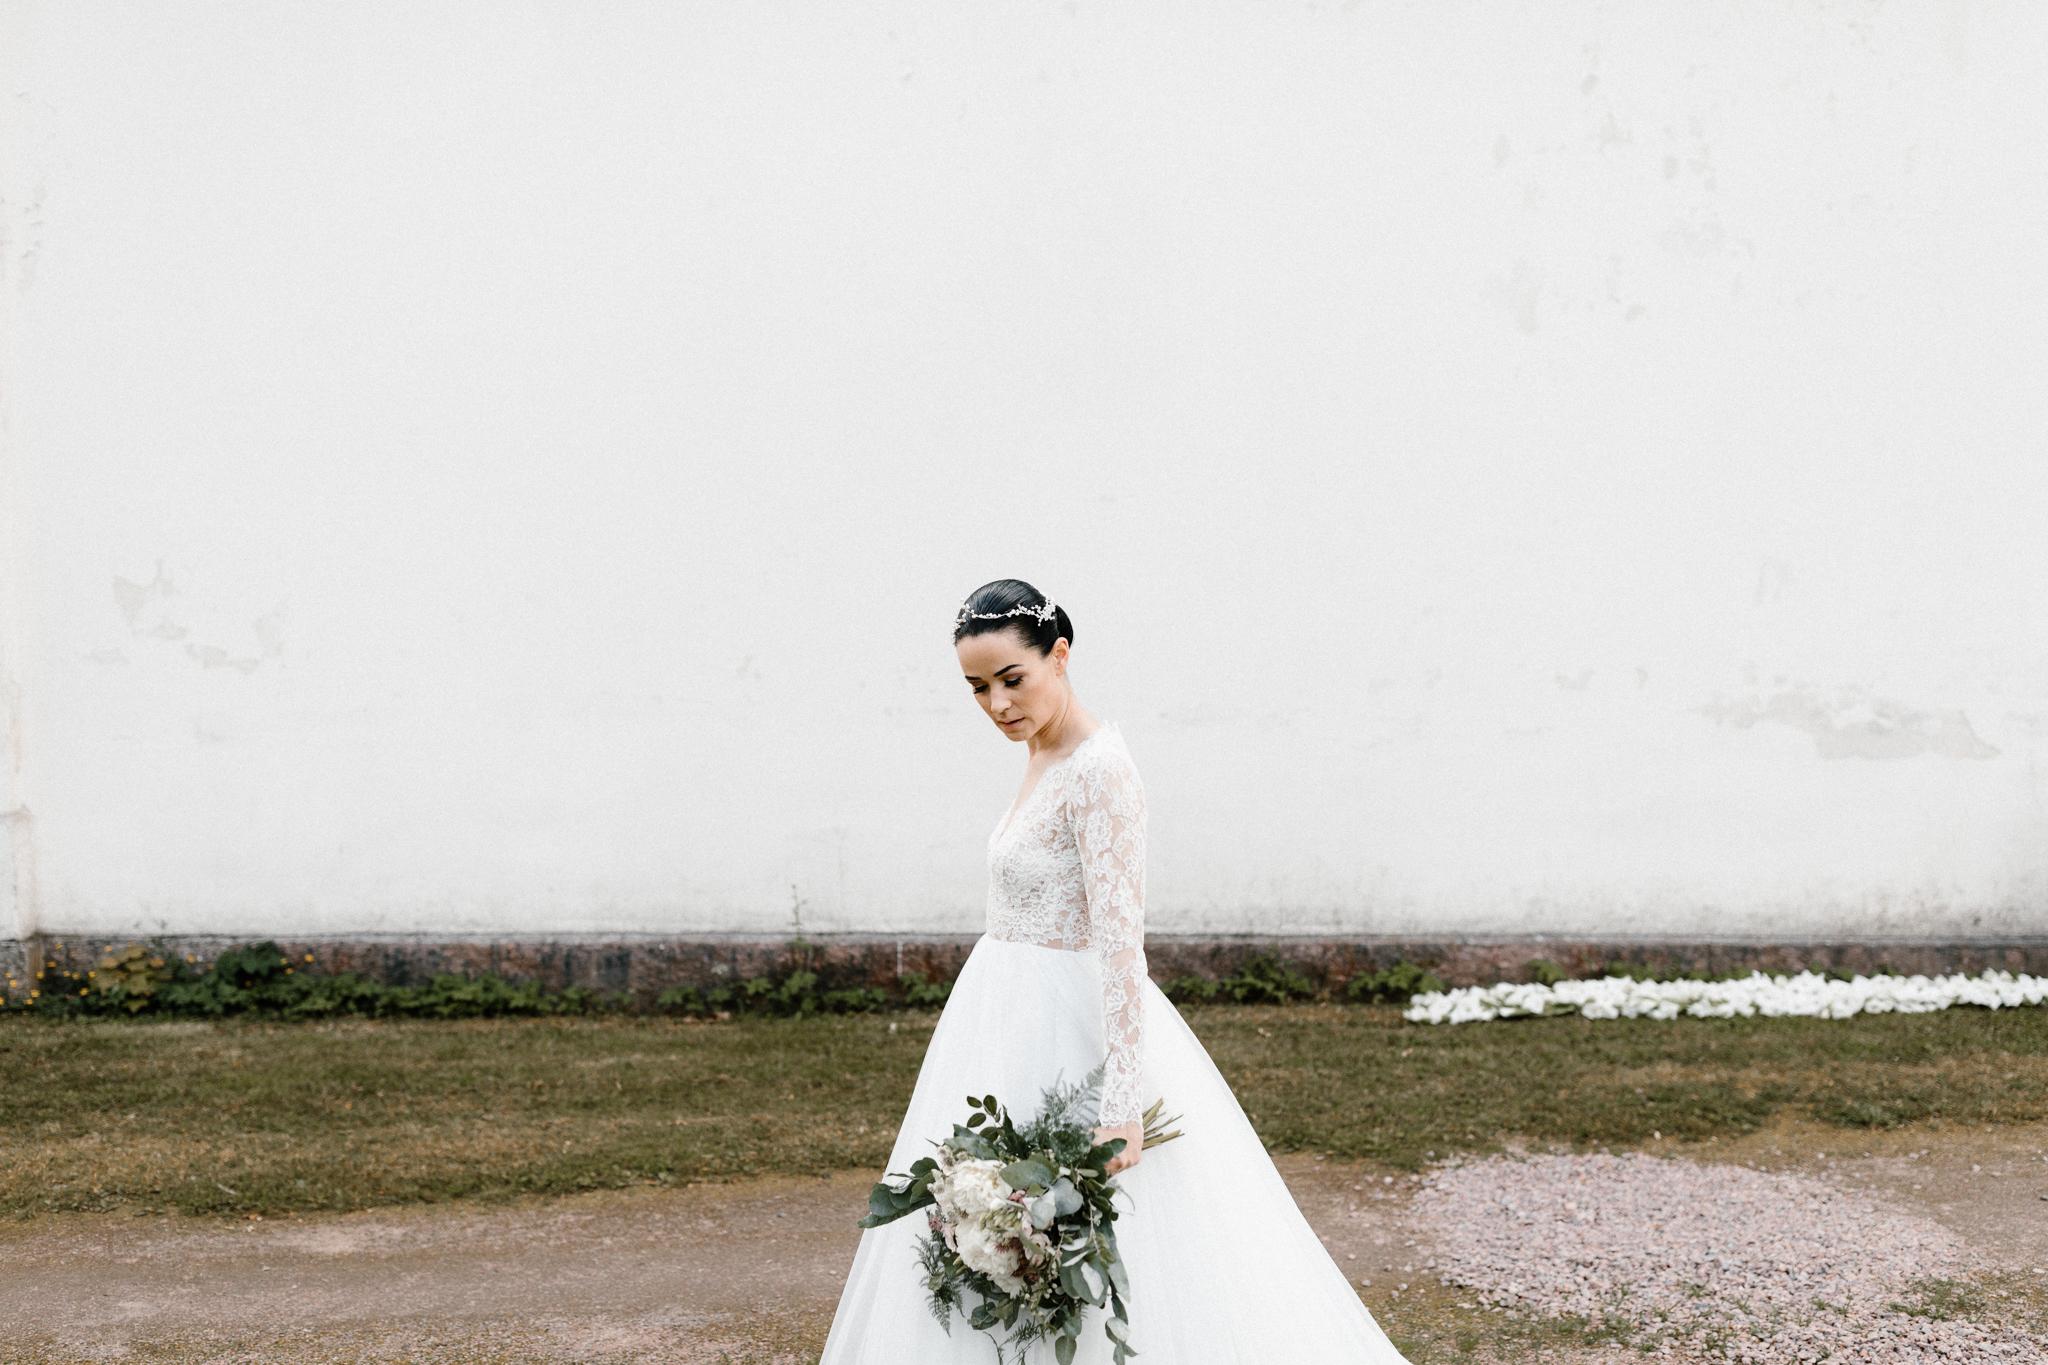 Essi + Ville   Oitbacka Gården   by Patrick Karkkolainen Wedding Photography-38.jpg